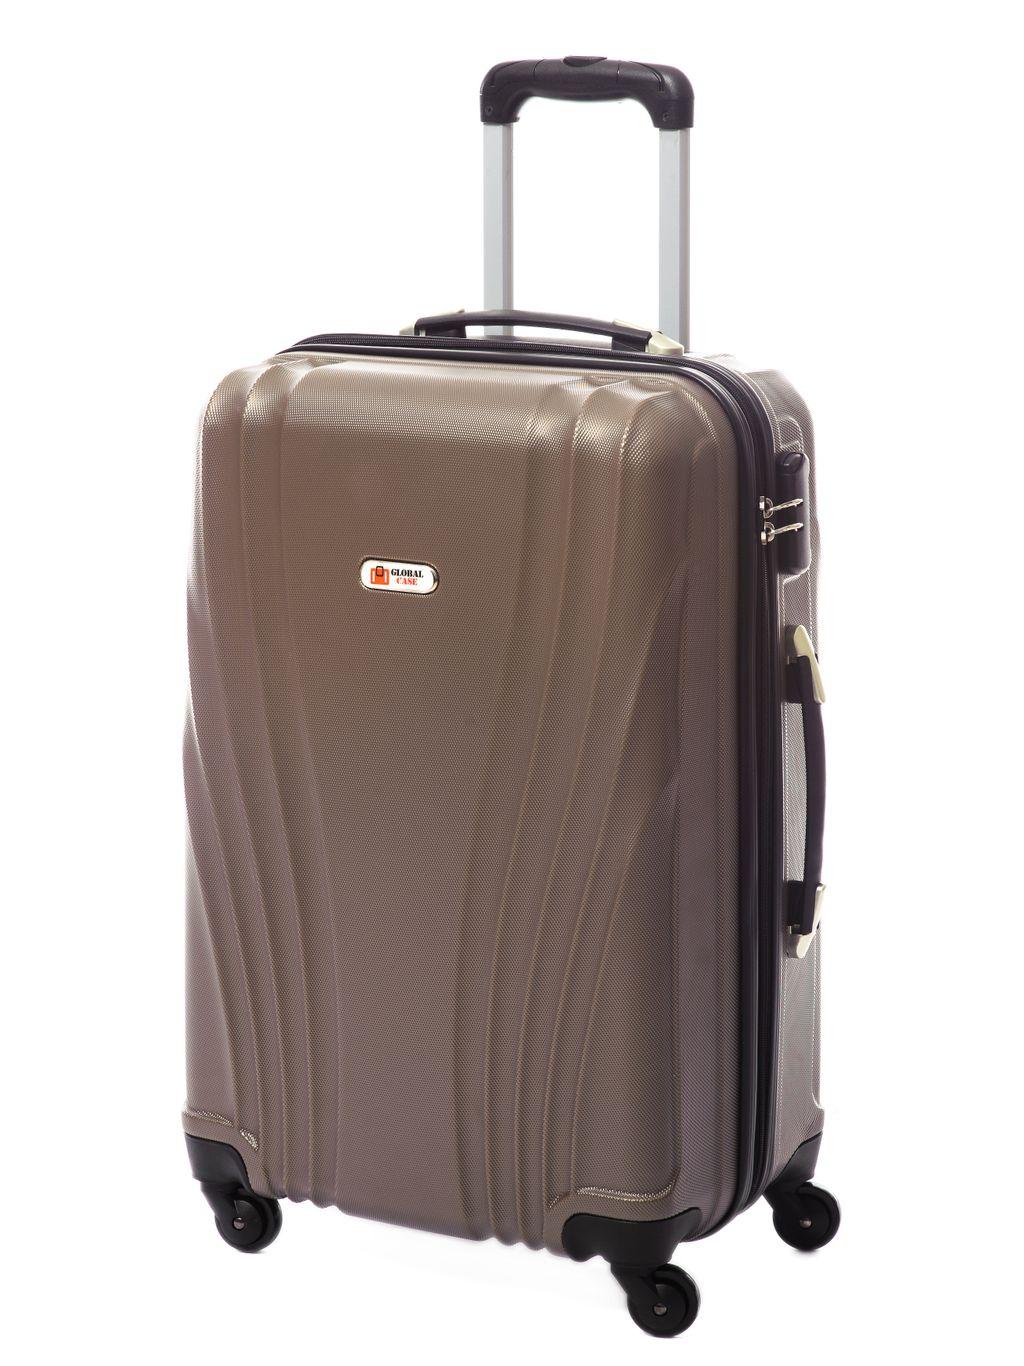 7c89fe51d322 Чемоданы Global Case - Пластиковый чемодан Global Case Коричневый ...